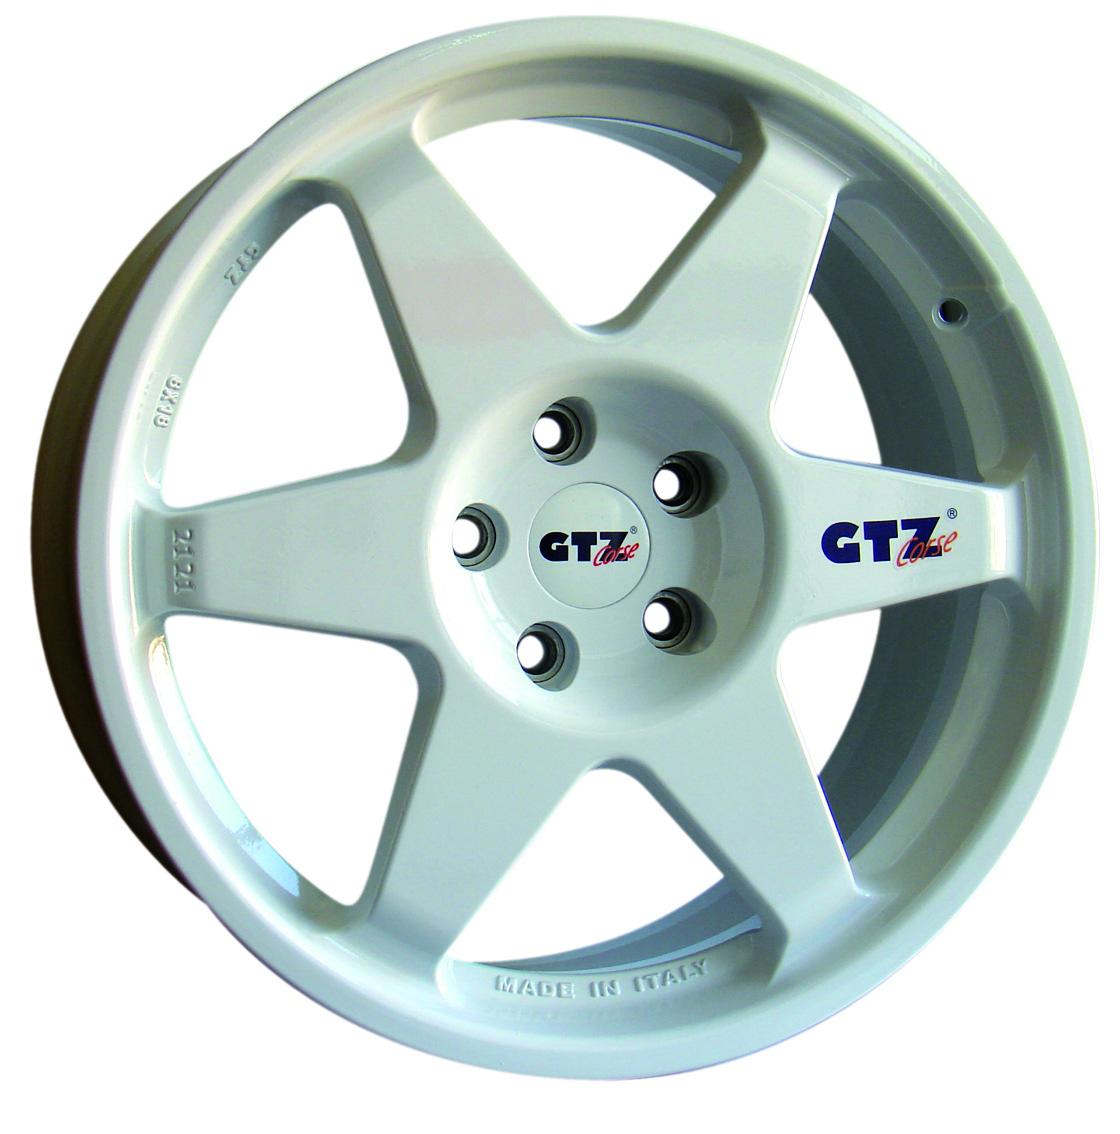 SPEEDLINE CORSE GTZ type 2121 8x18 5x120 ET15 WHITE